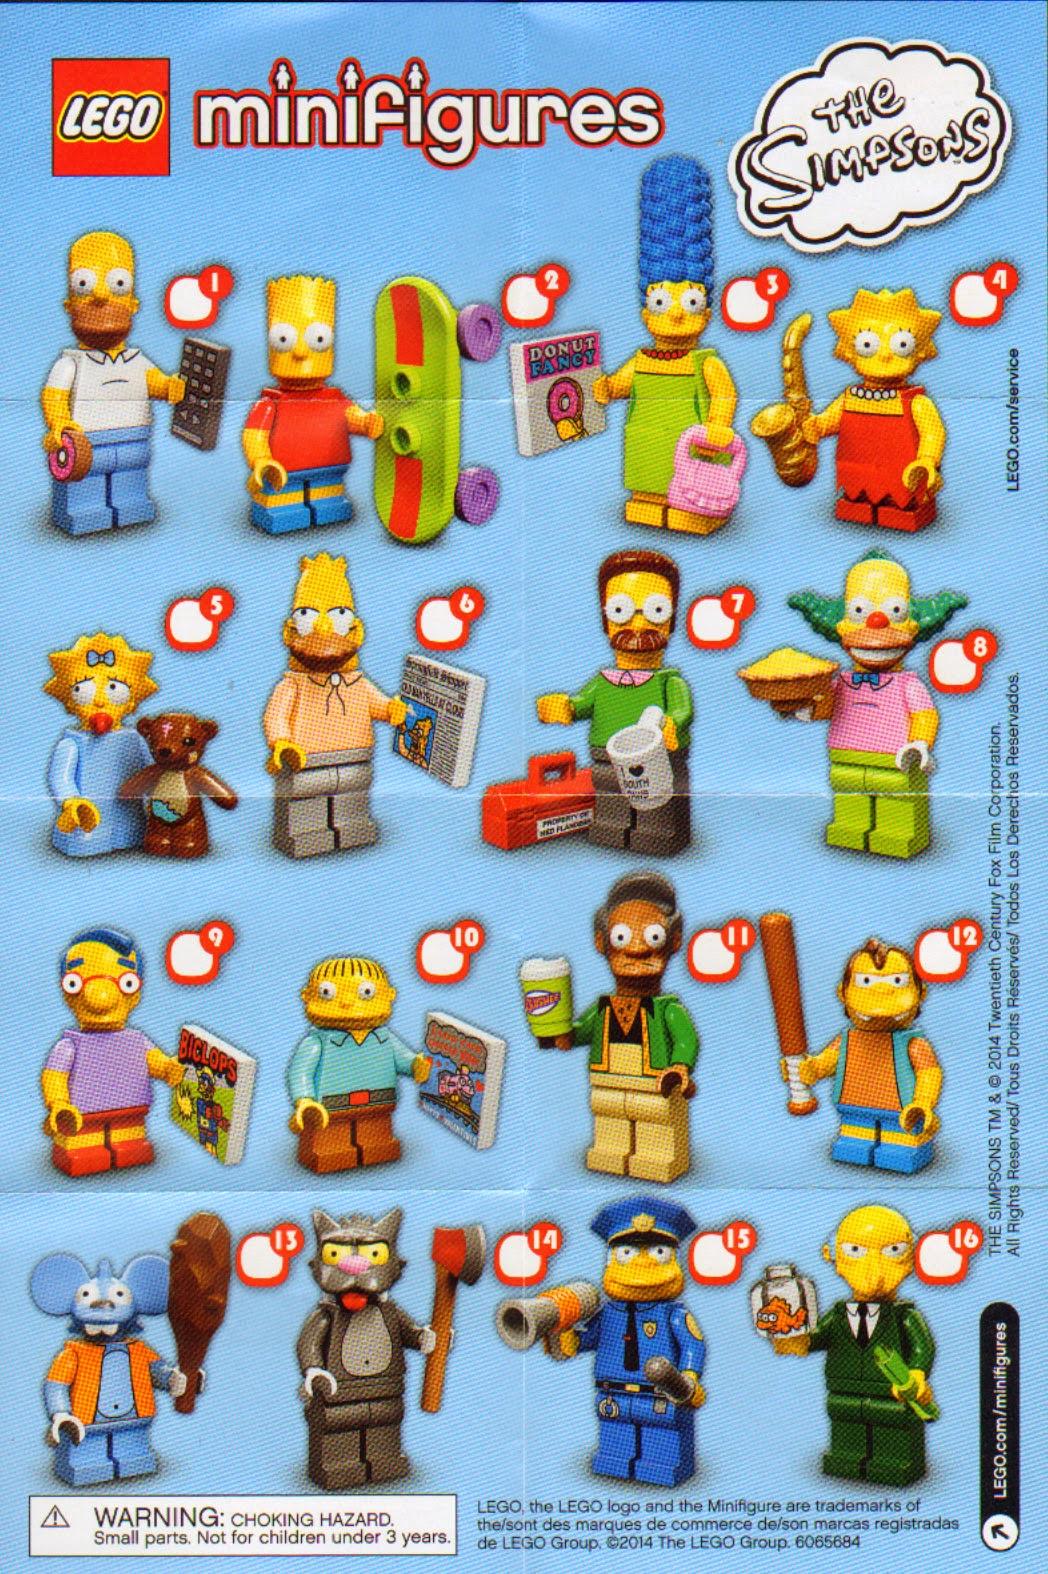 The Minifigure Collector Lego Minifigure Series 1 19